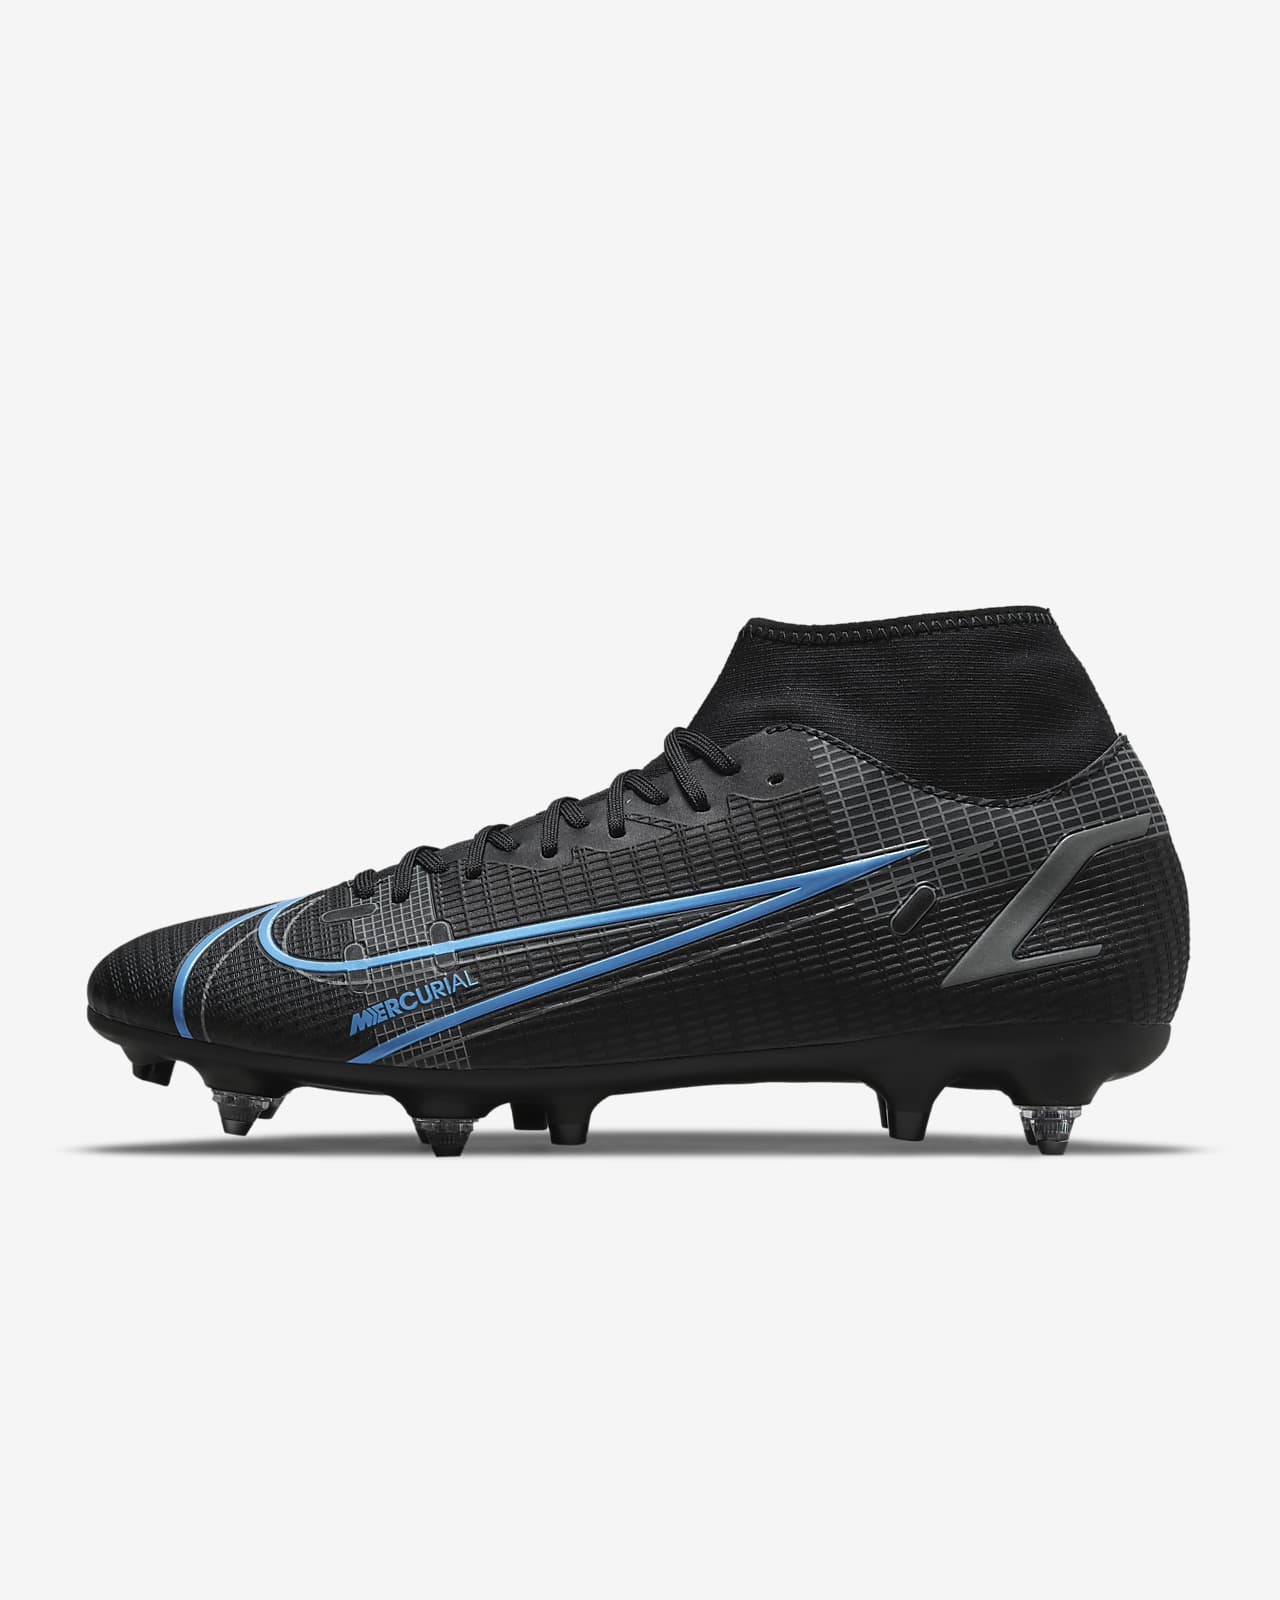 Chaussure de football à crampons pour terrain gras Nike Mercurial Superfly 8 Academy SG-Pro AC